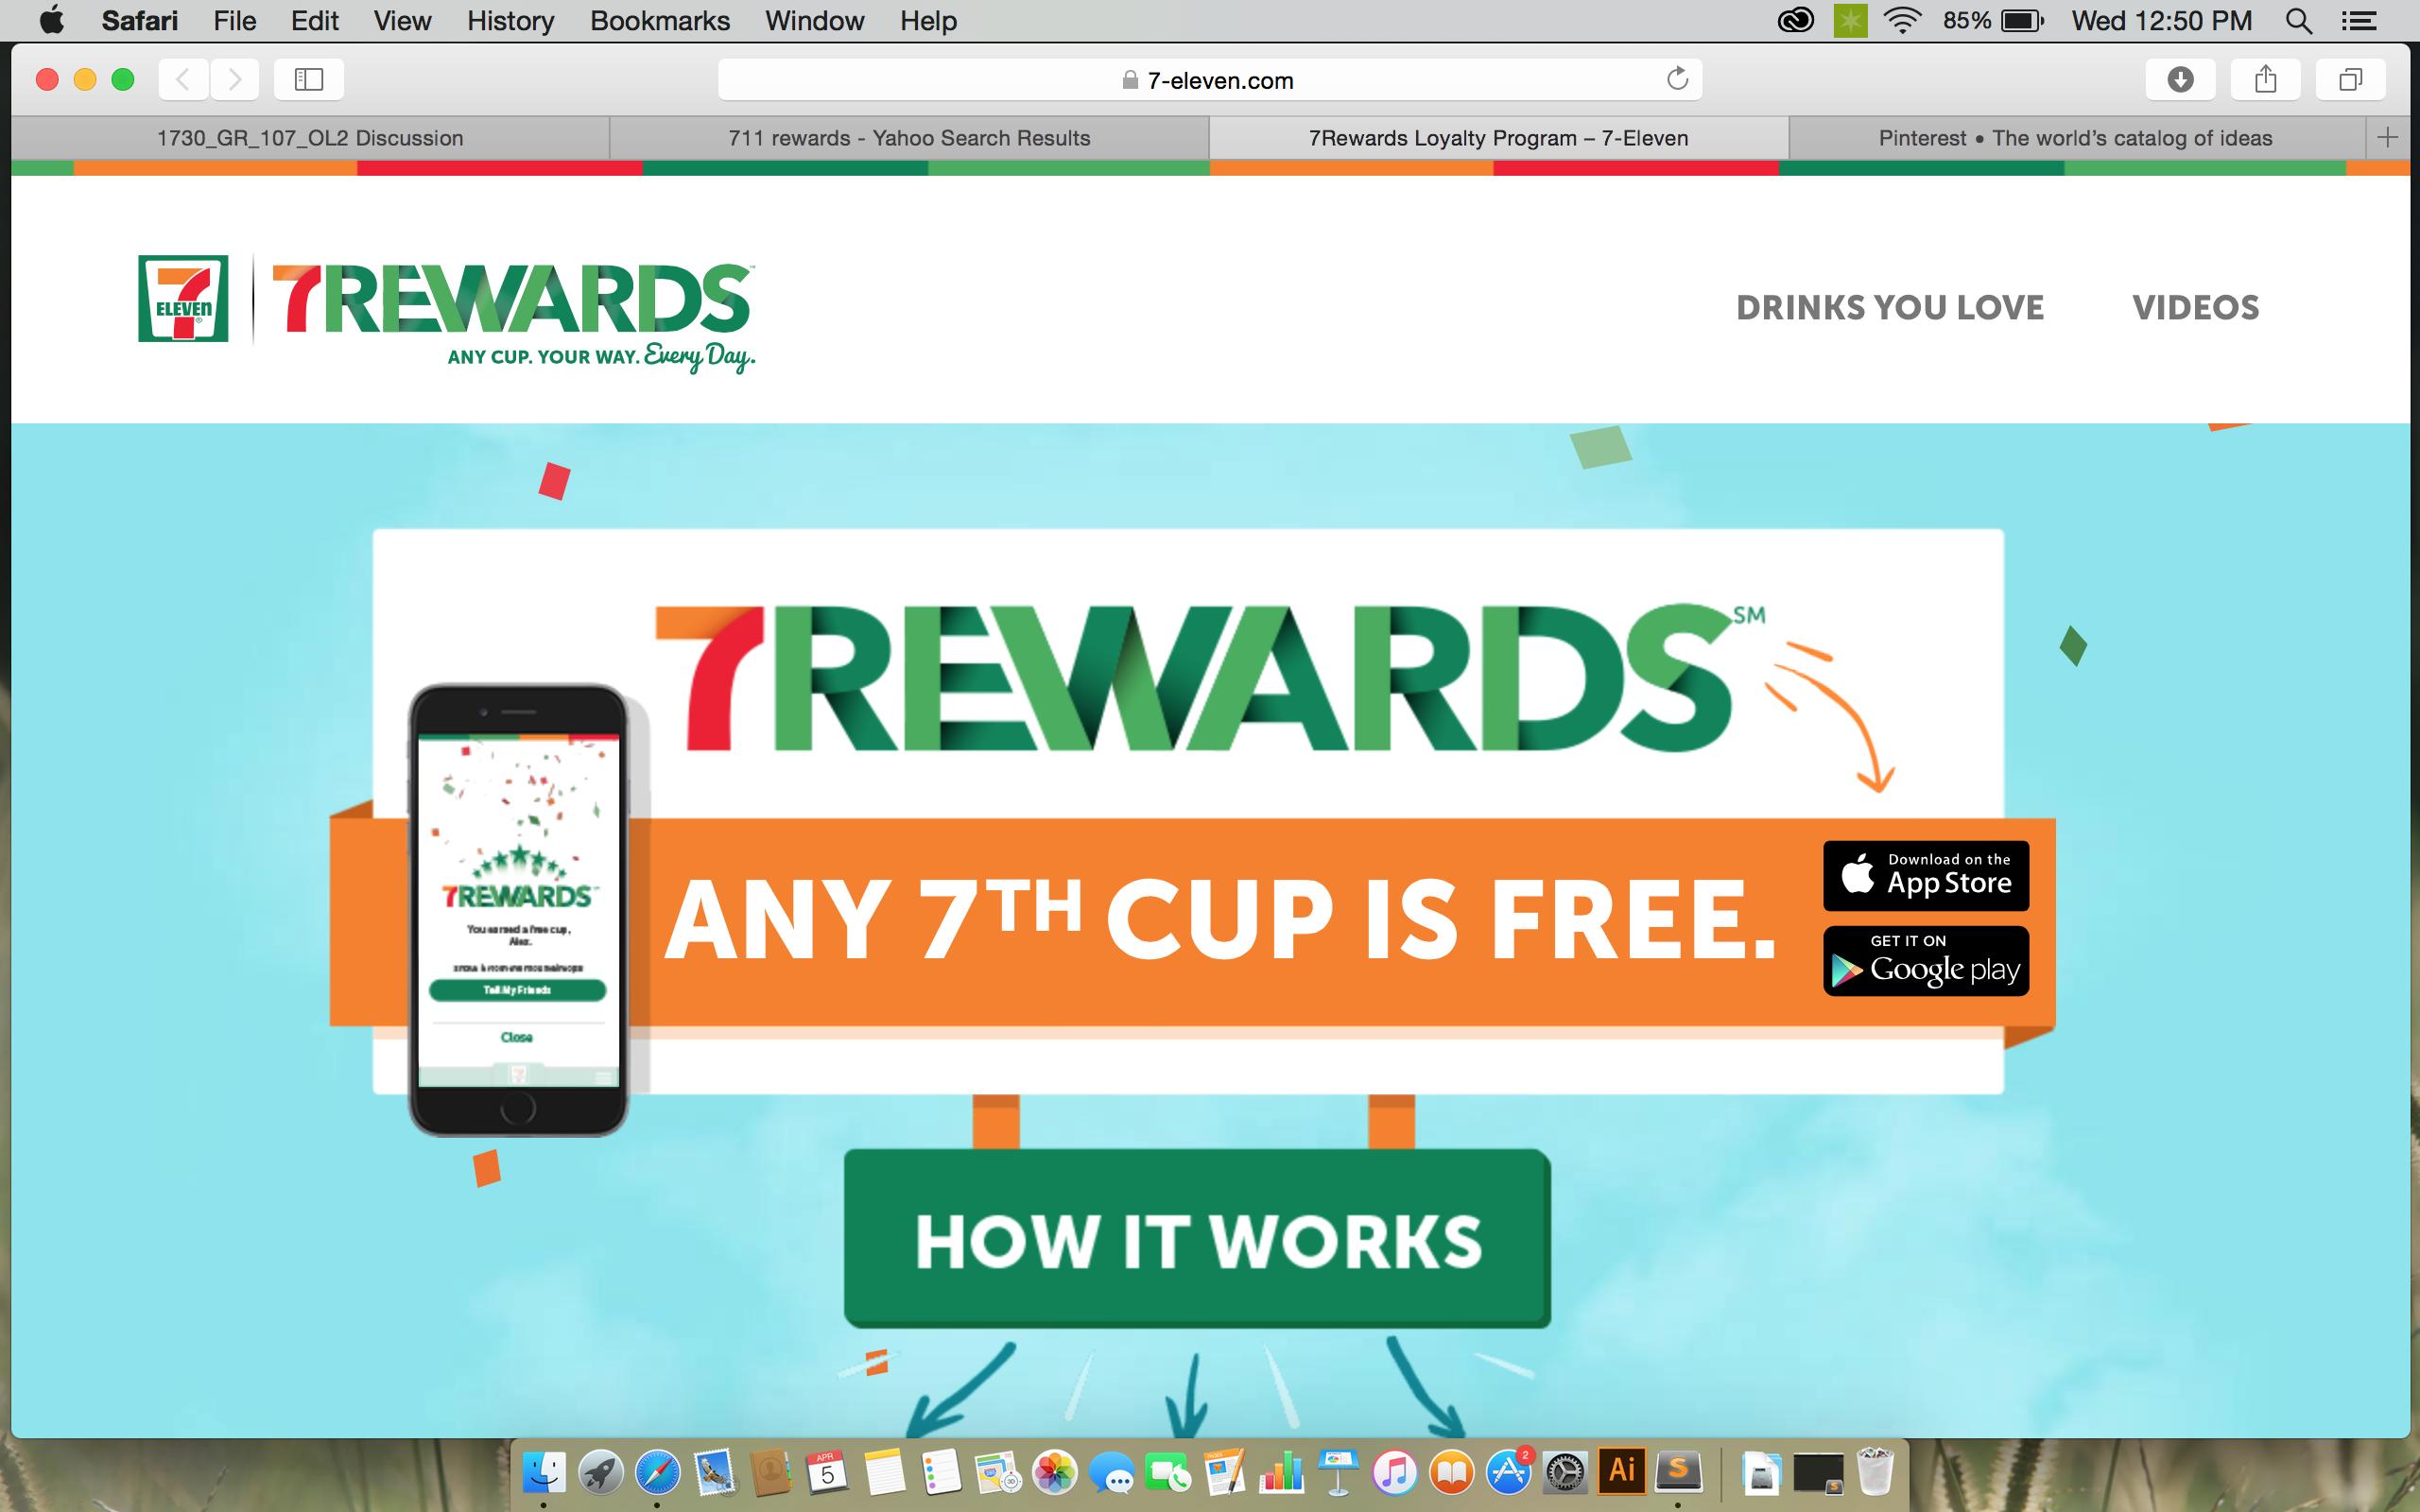 711 rewards program Free rewards, App, Drinks